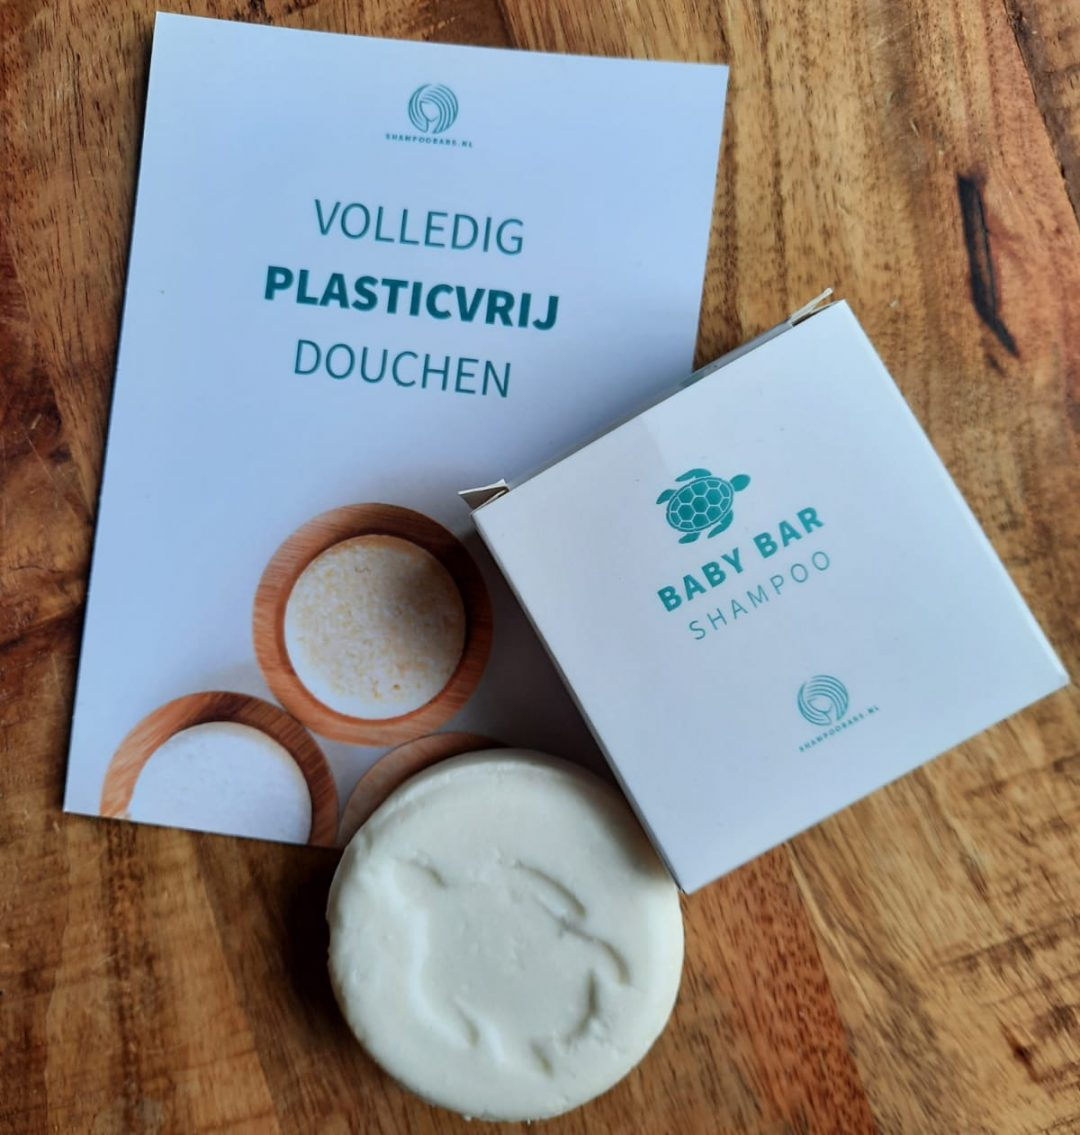 review shampoobars.nl plasticvrij douchen zeep shampoo conditioner